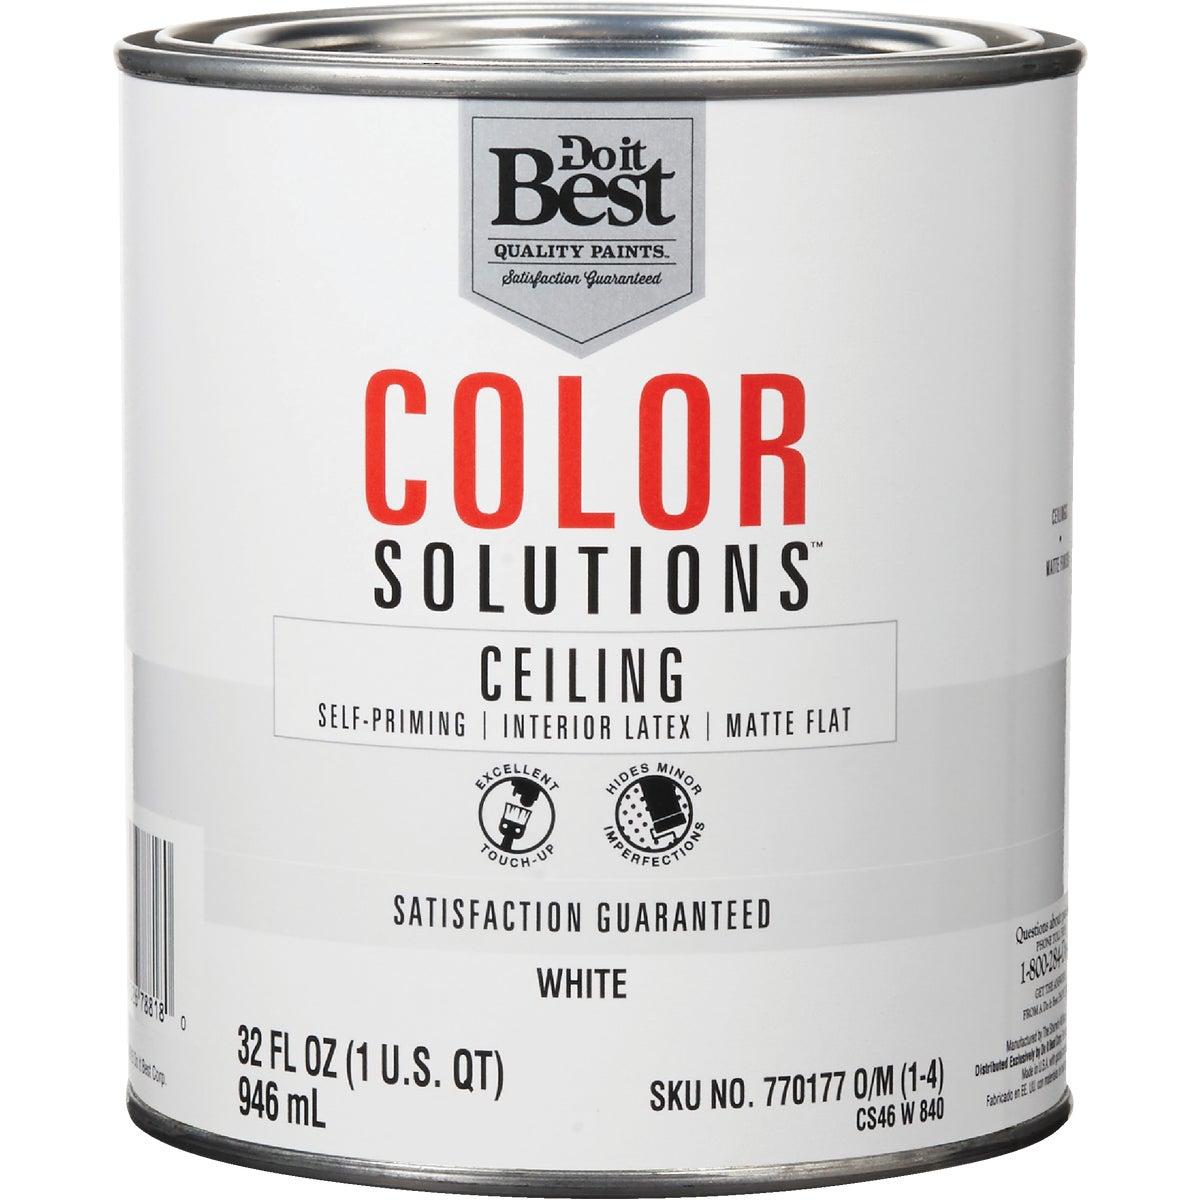 FLAT WHITE CEILING PAINT - CS46W0840-44 by Do it Best